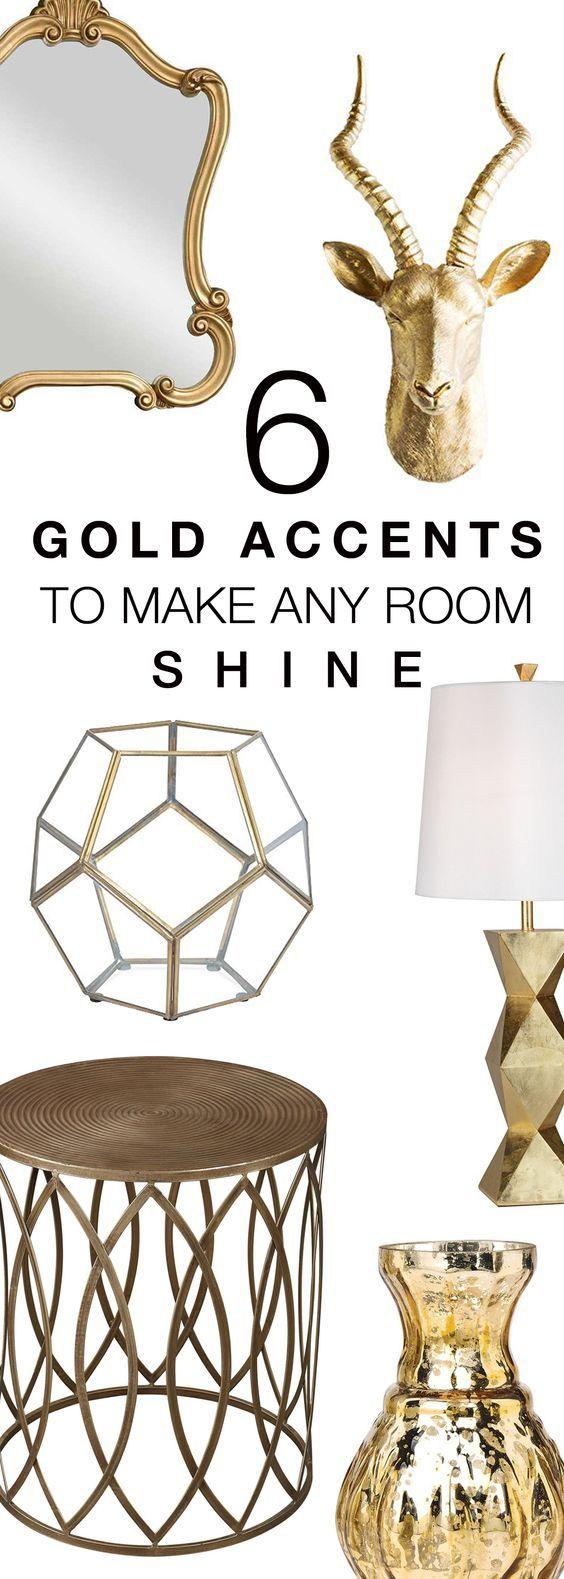 1130 best Interior Home Decor images on Pinterest Home dcor